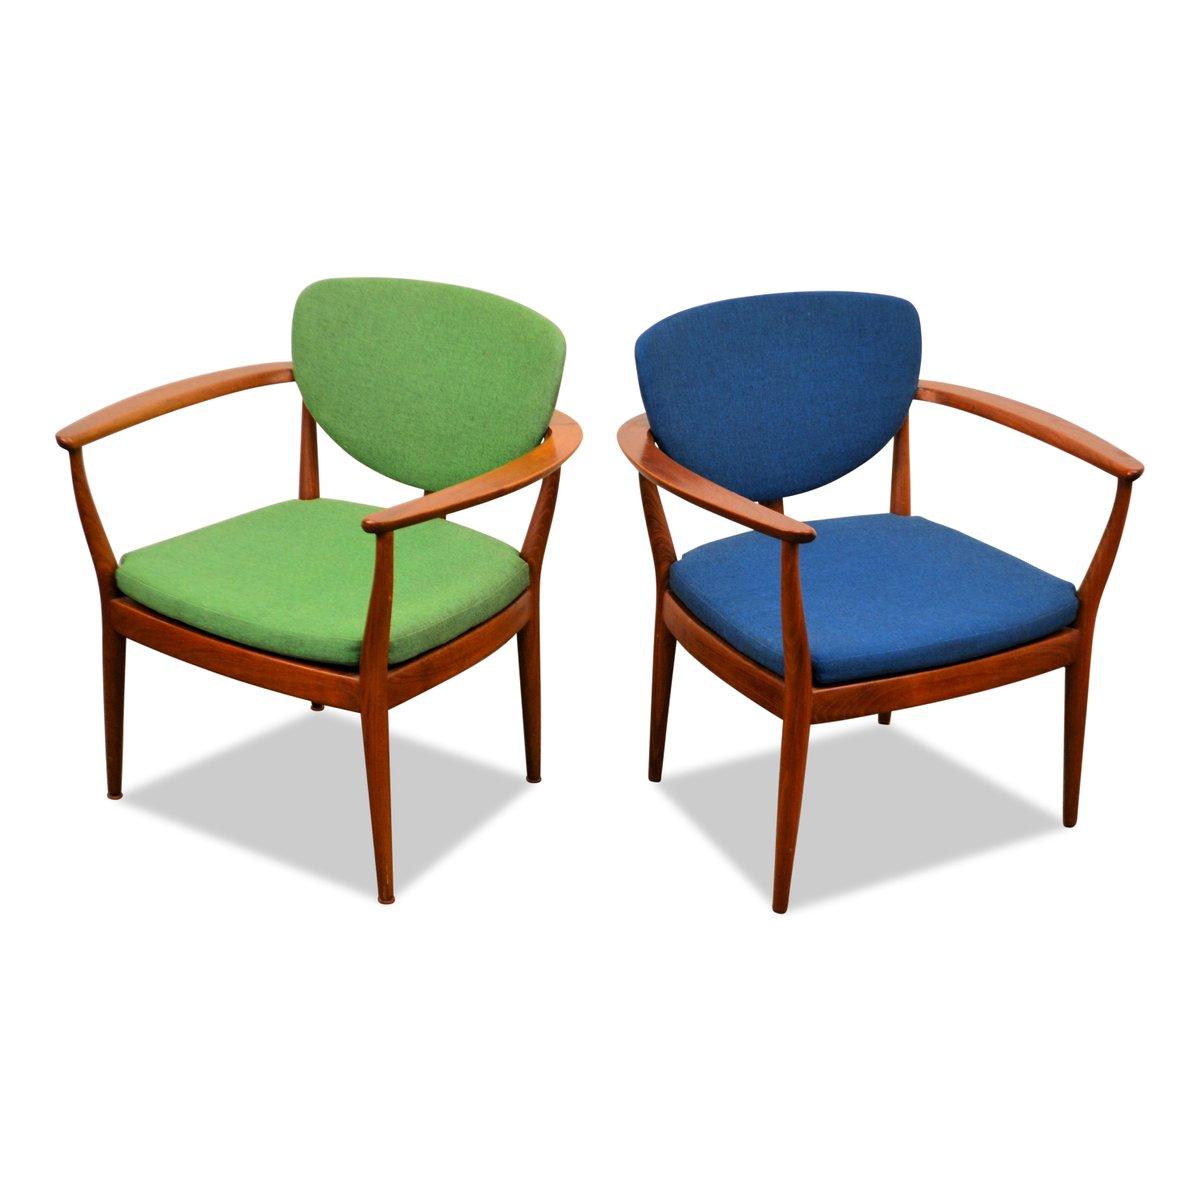 Danish Green Amp Blue Teak Lounge Chairs Set Of 2 For Sale